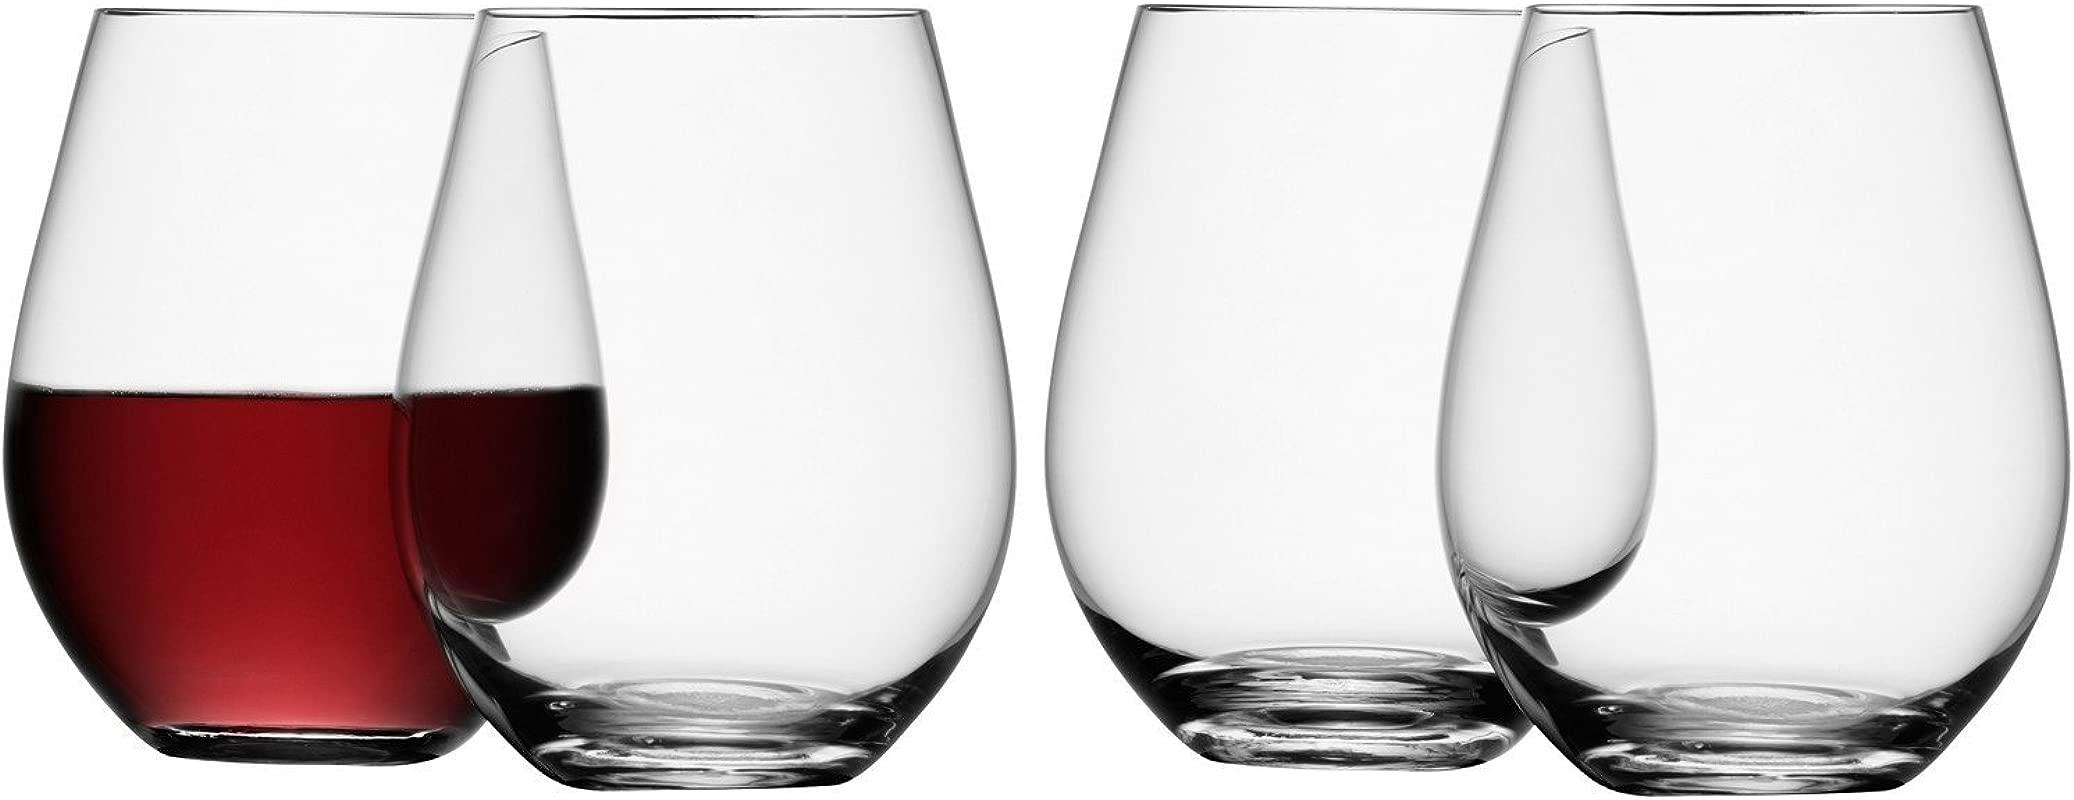 LSA International Stemless Red Wine Glass 4 Pack 17 8 Fl Oz Clear